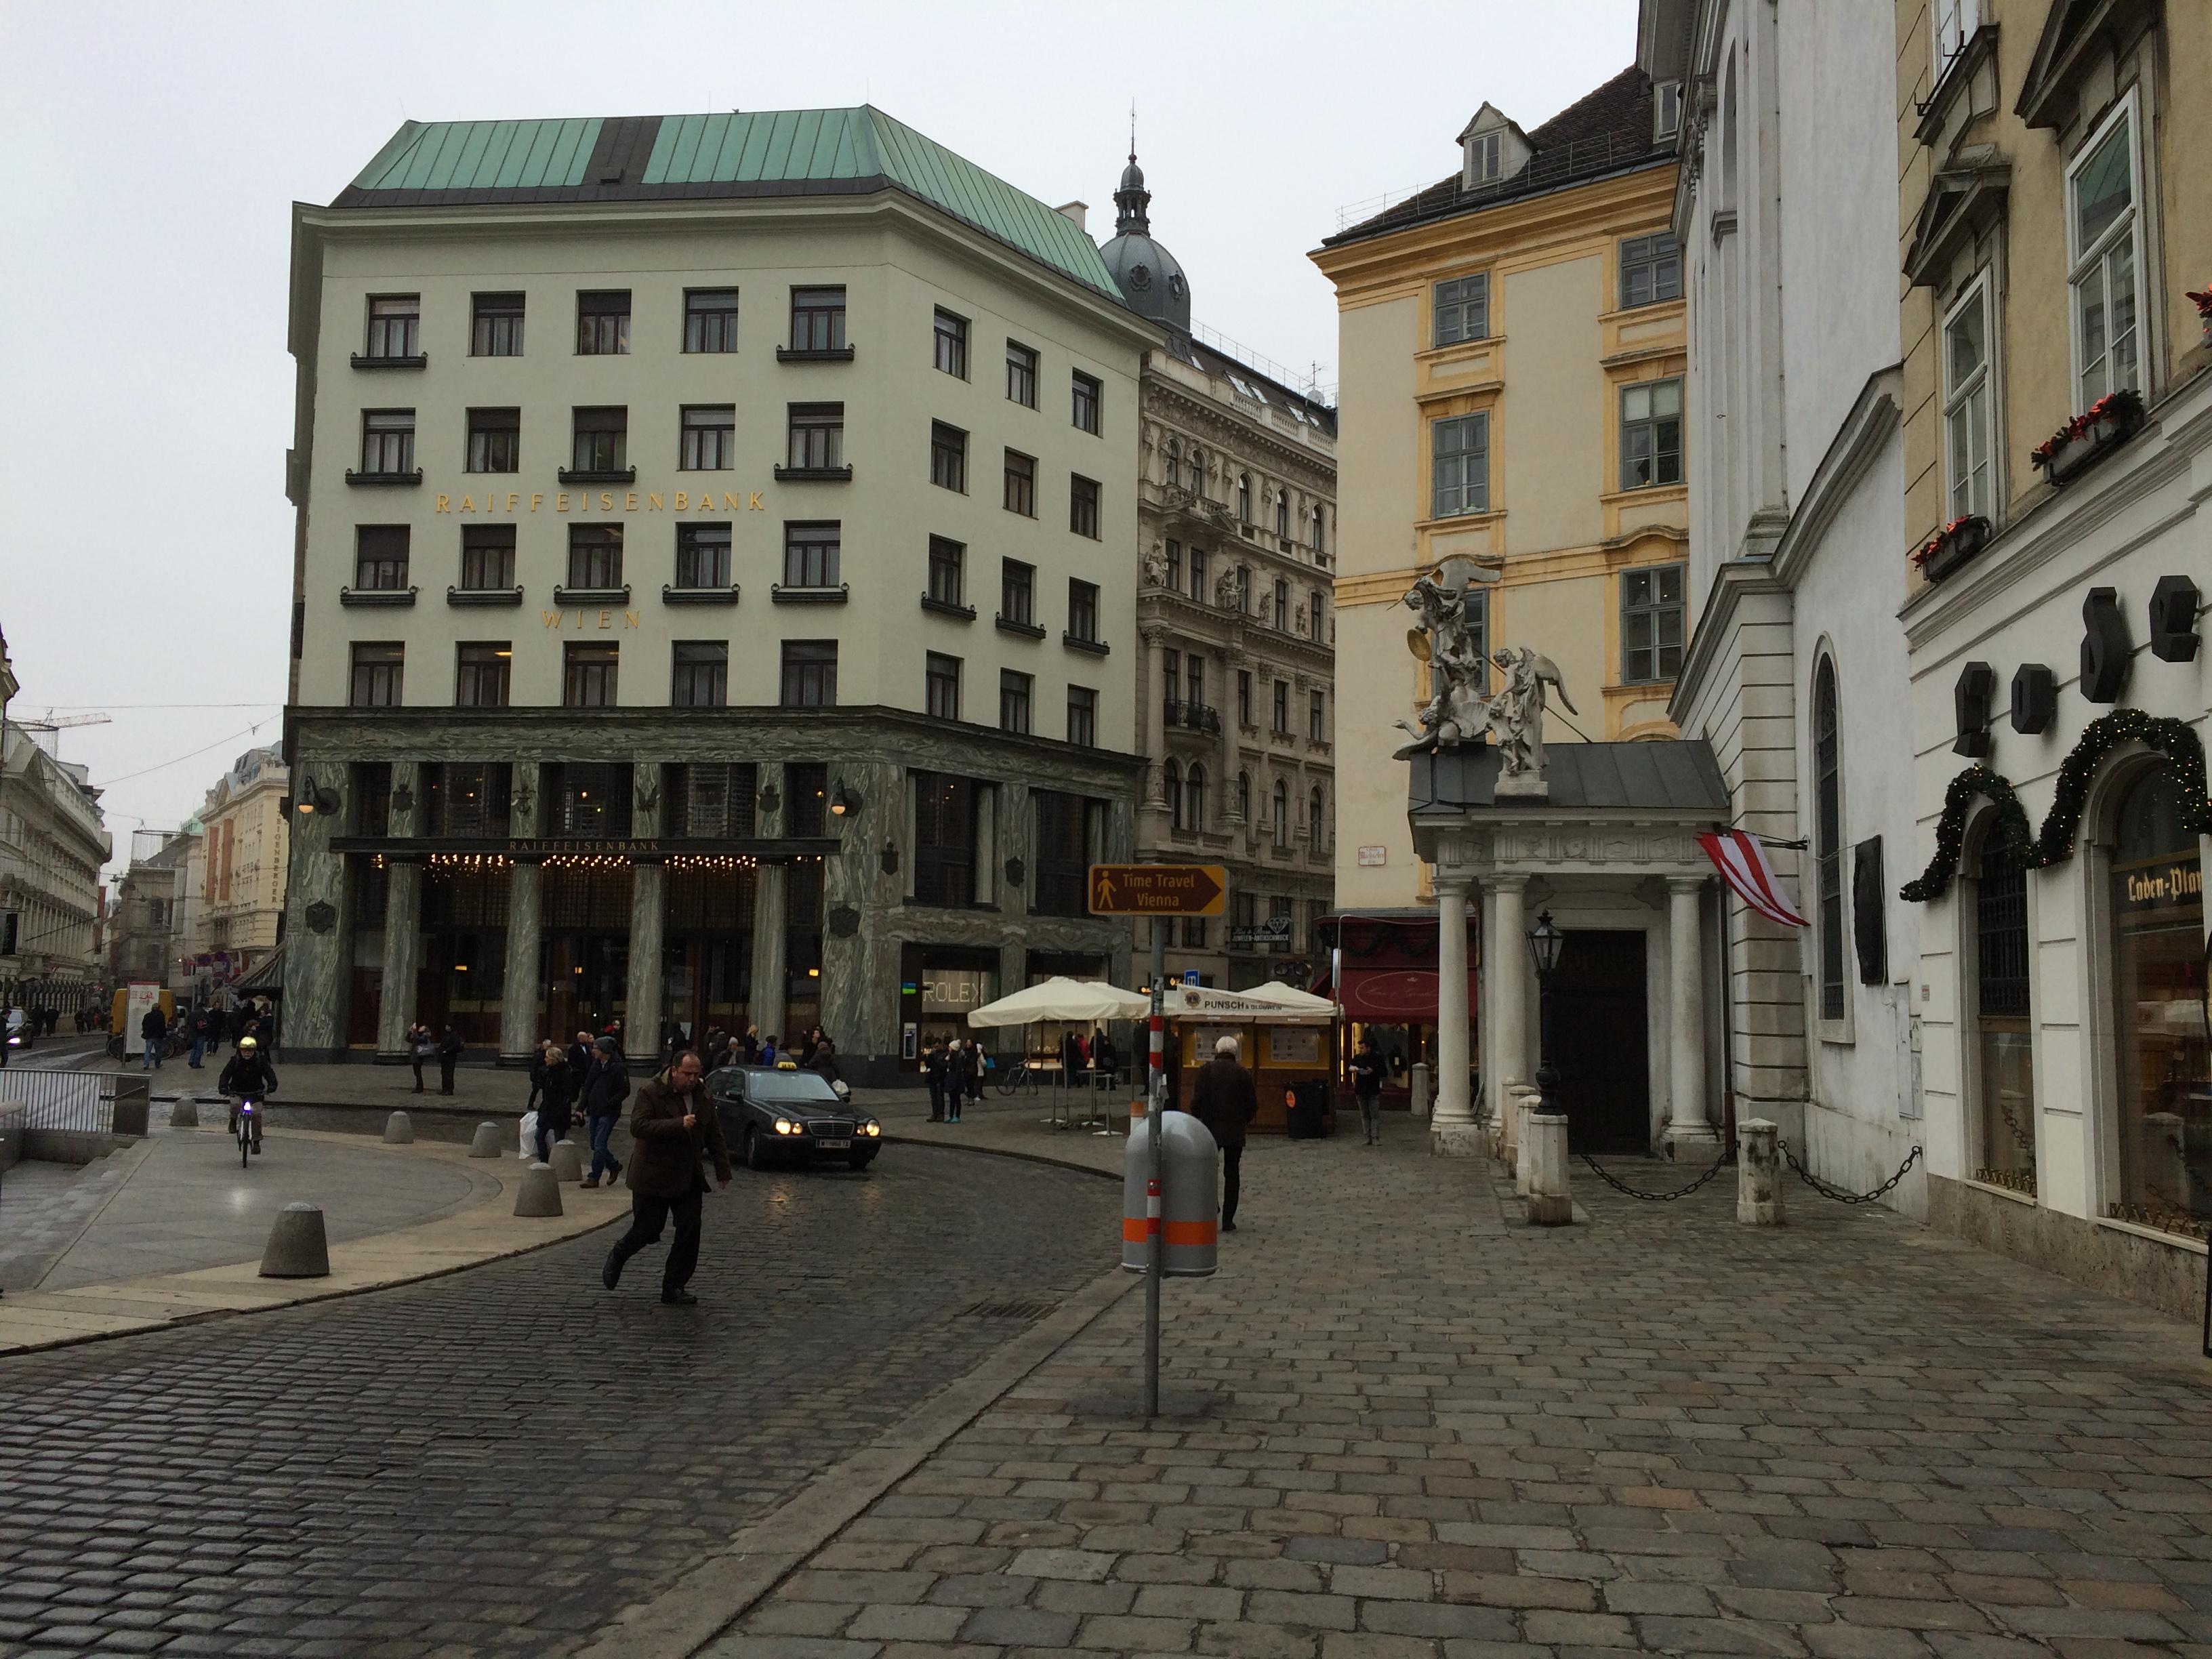 Loos House / Raiffeisenbank